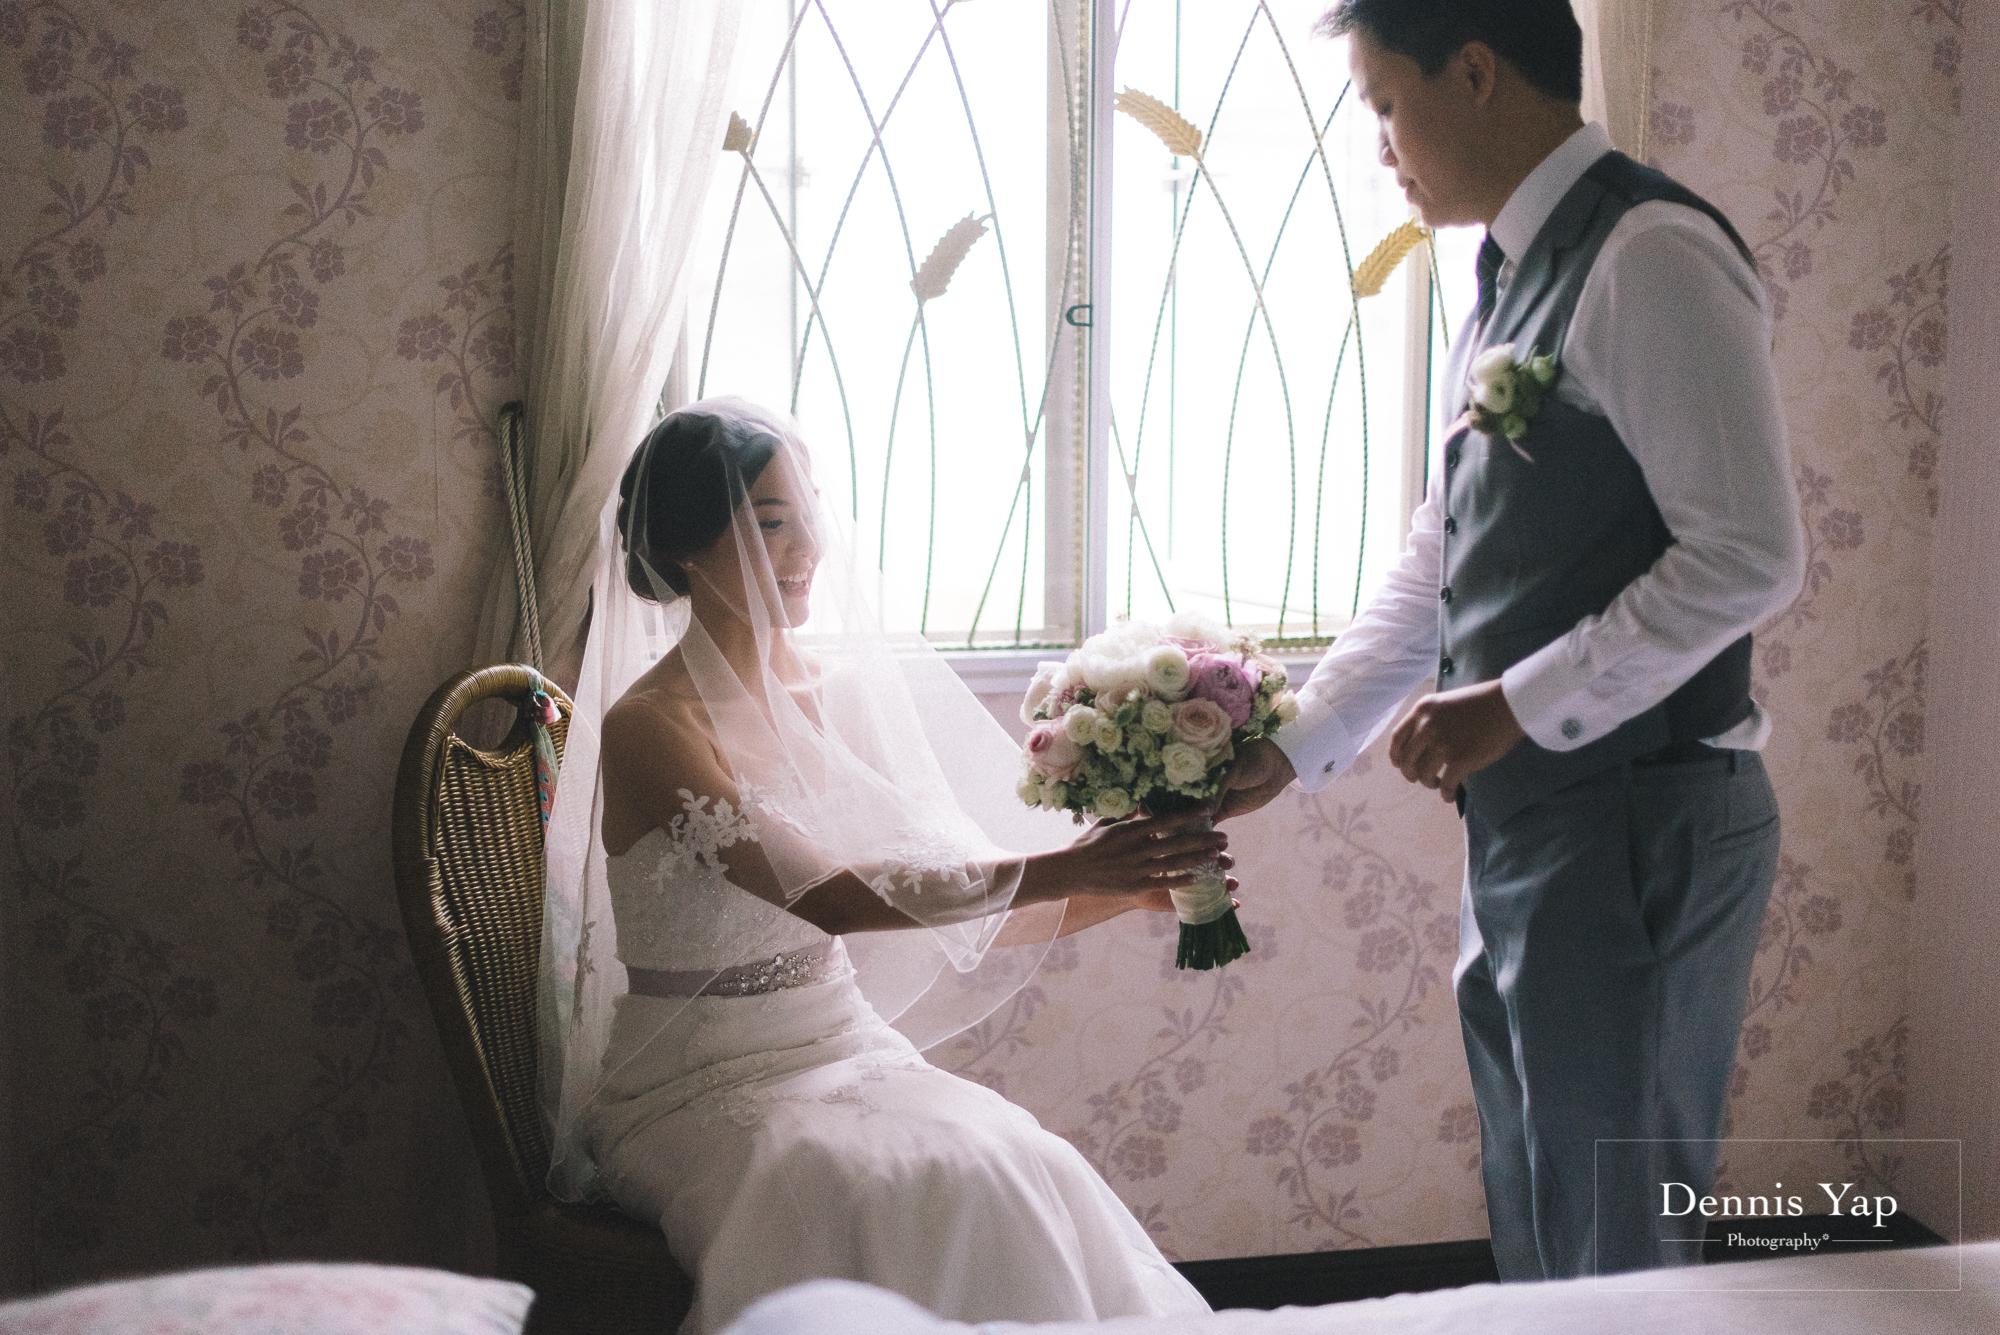 chin foo sze yin wedding day botanic klang club house dennis yap photography-13.jpg